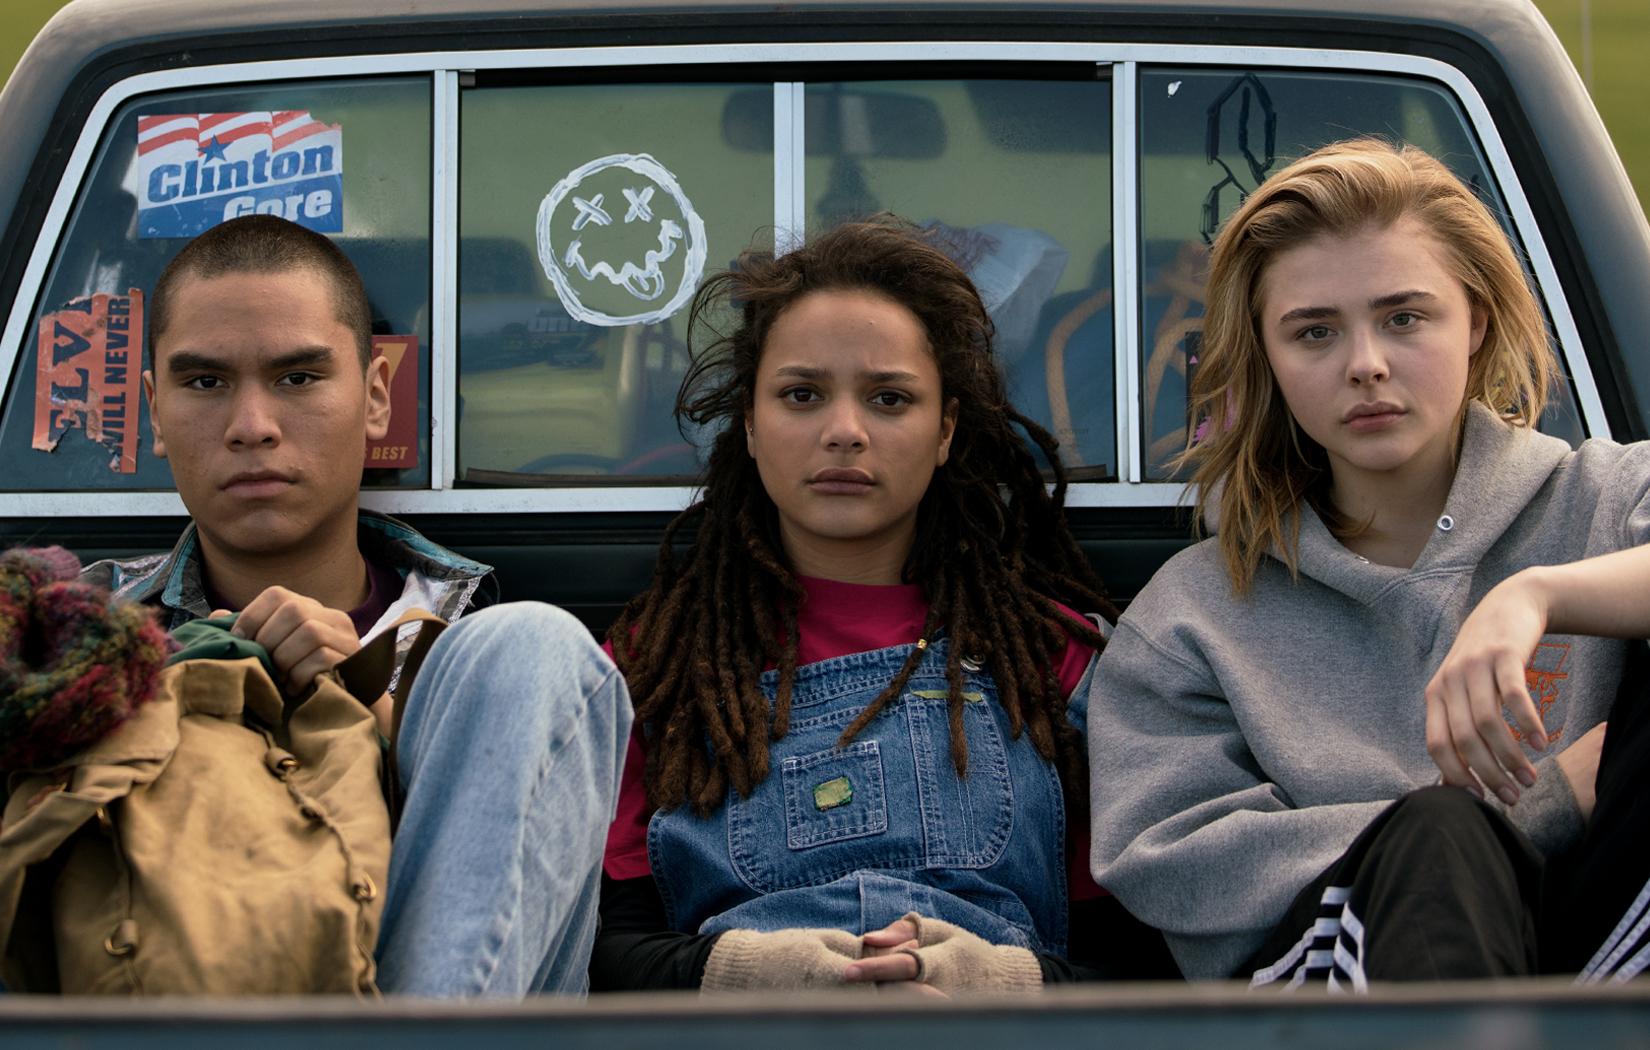 2018-seattle-internation-film-festival-the-miseducation-of-cameron-post.jpg